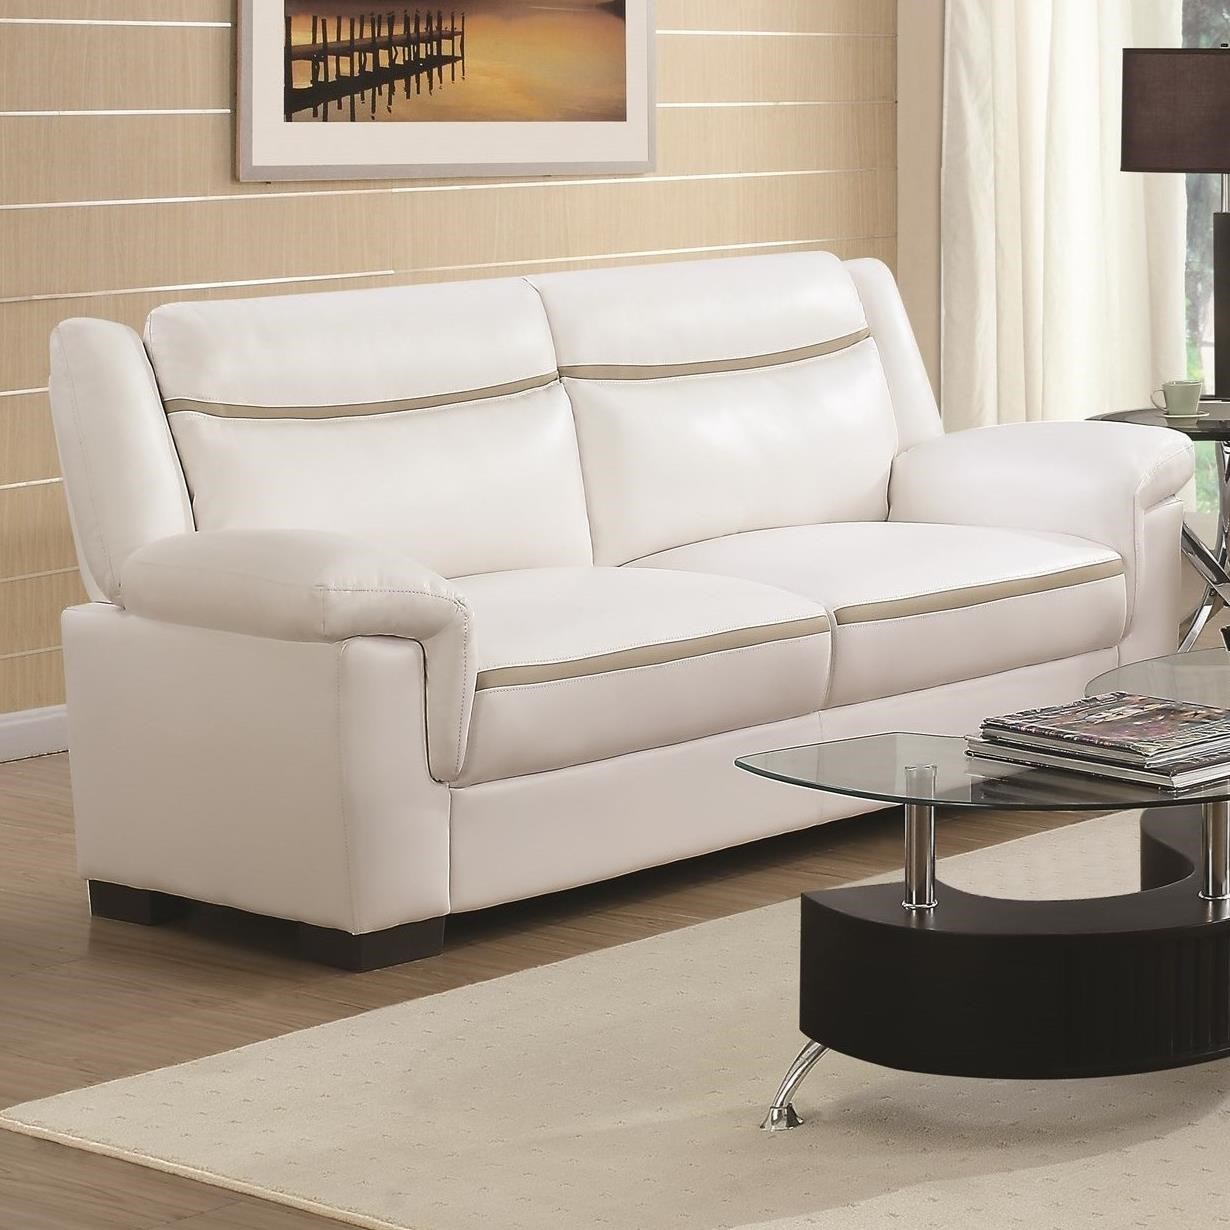 Coaster Arabella Contemporary Leatherette Sofa Value City - Arabella coffee table